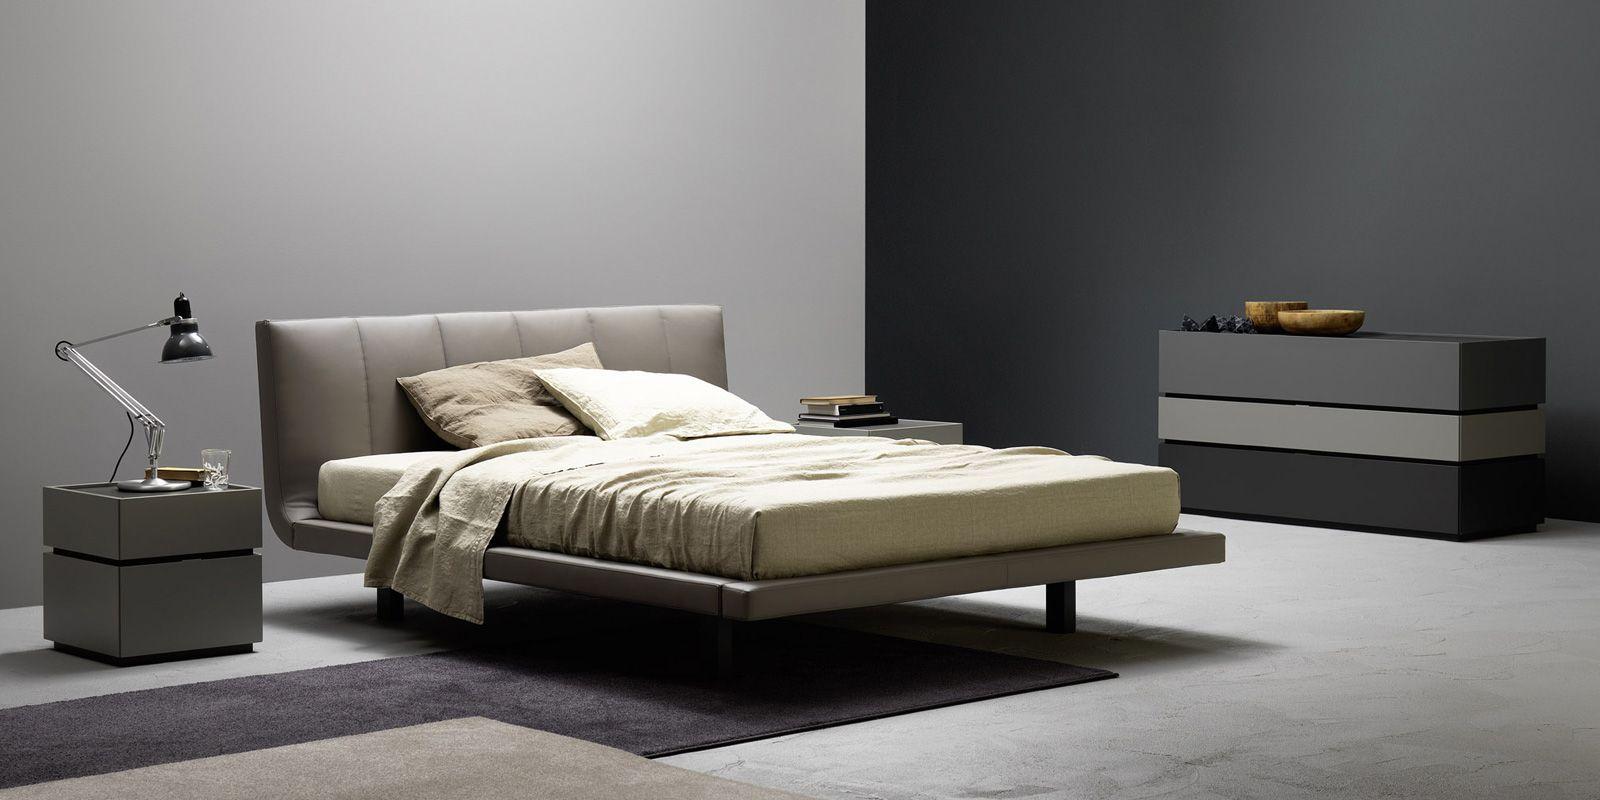 Camere da letto mobilificio san giacomo letto sirio rifarecasa maistatocosifacile grazie a - Camere da letto san giacomo ...